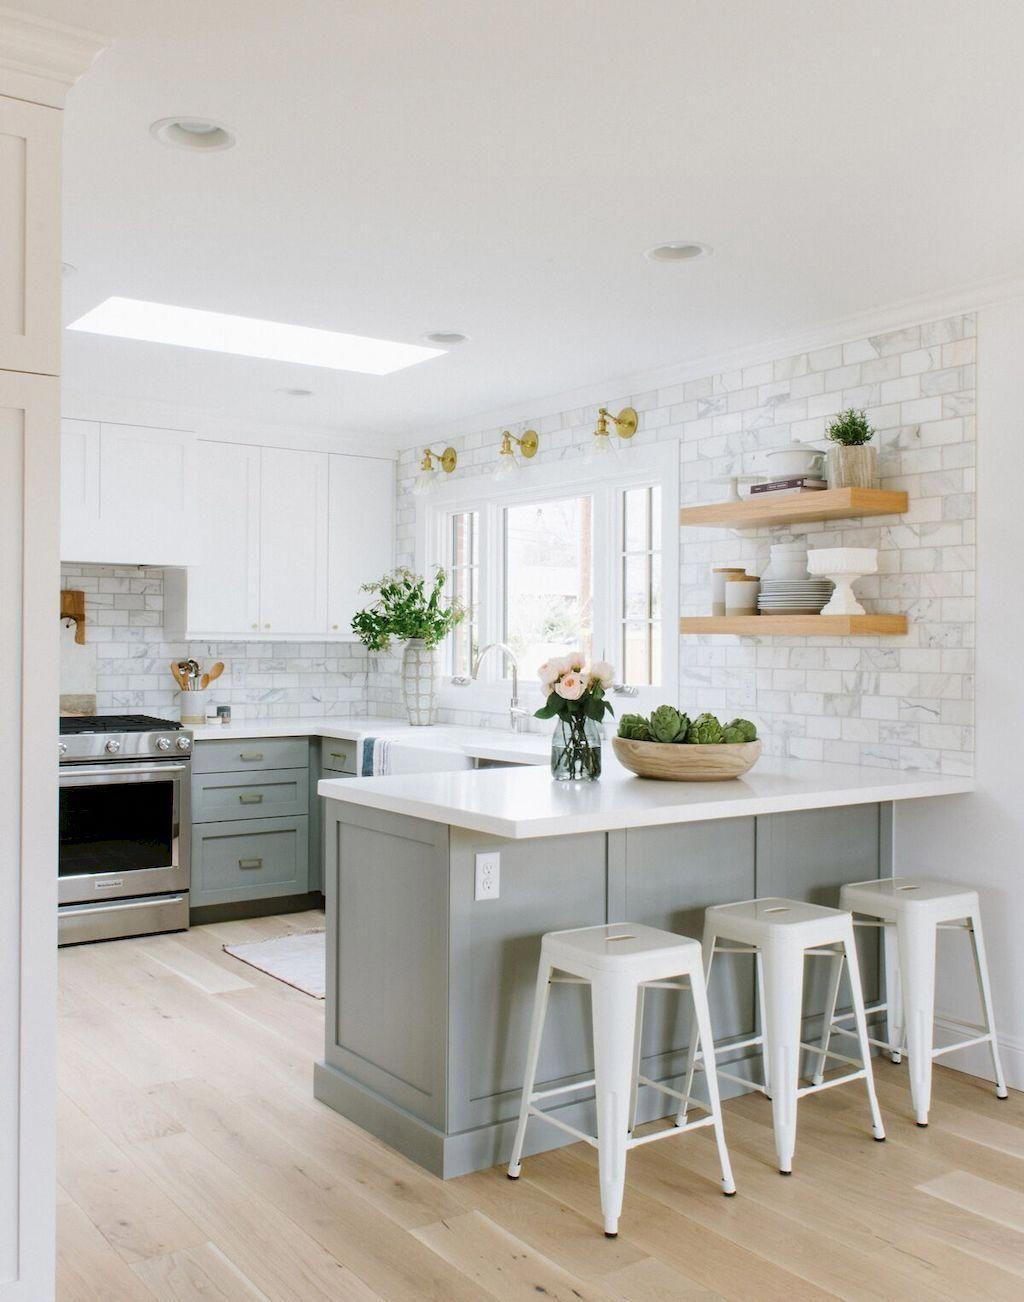 Shelf across kitchen window  kitchenrenovations  kitchen in   pinterest  kitchen flooring